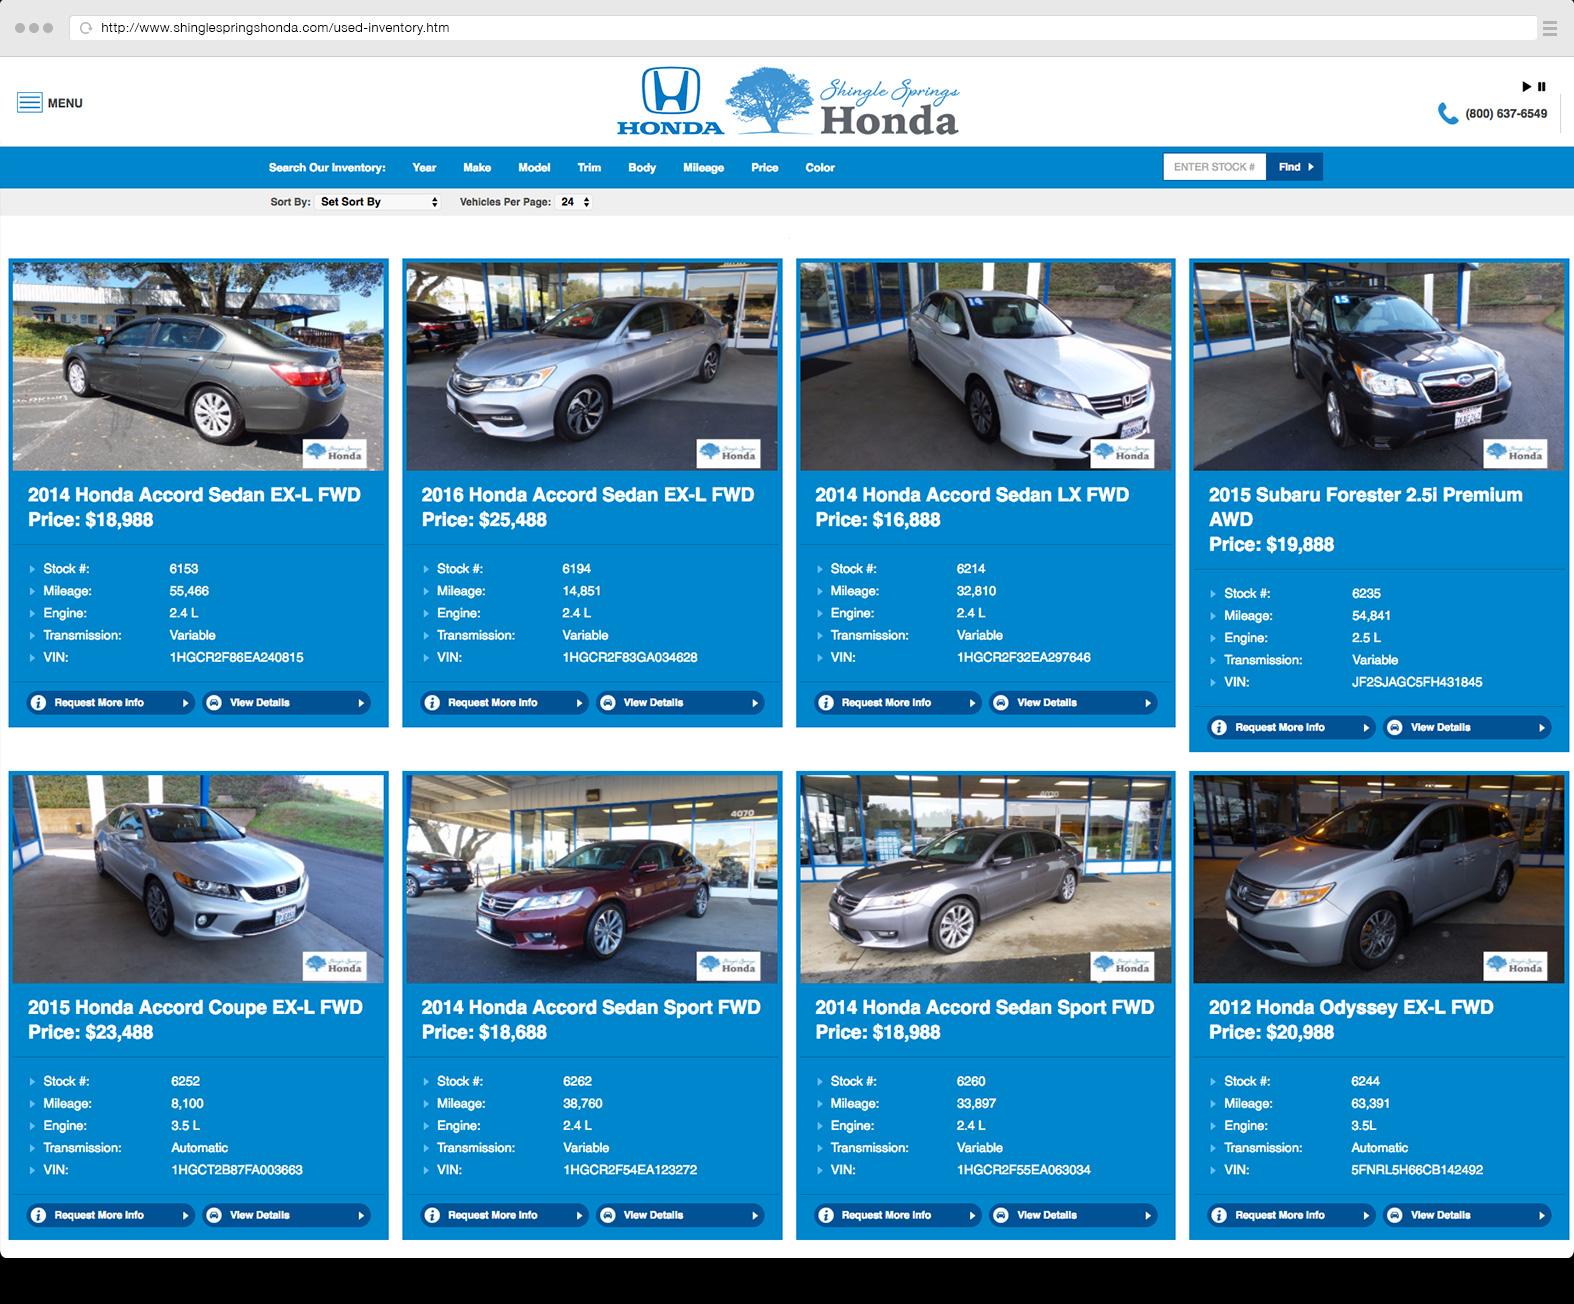 Inventory listing